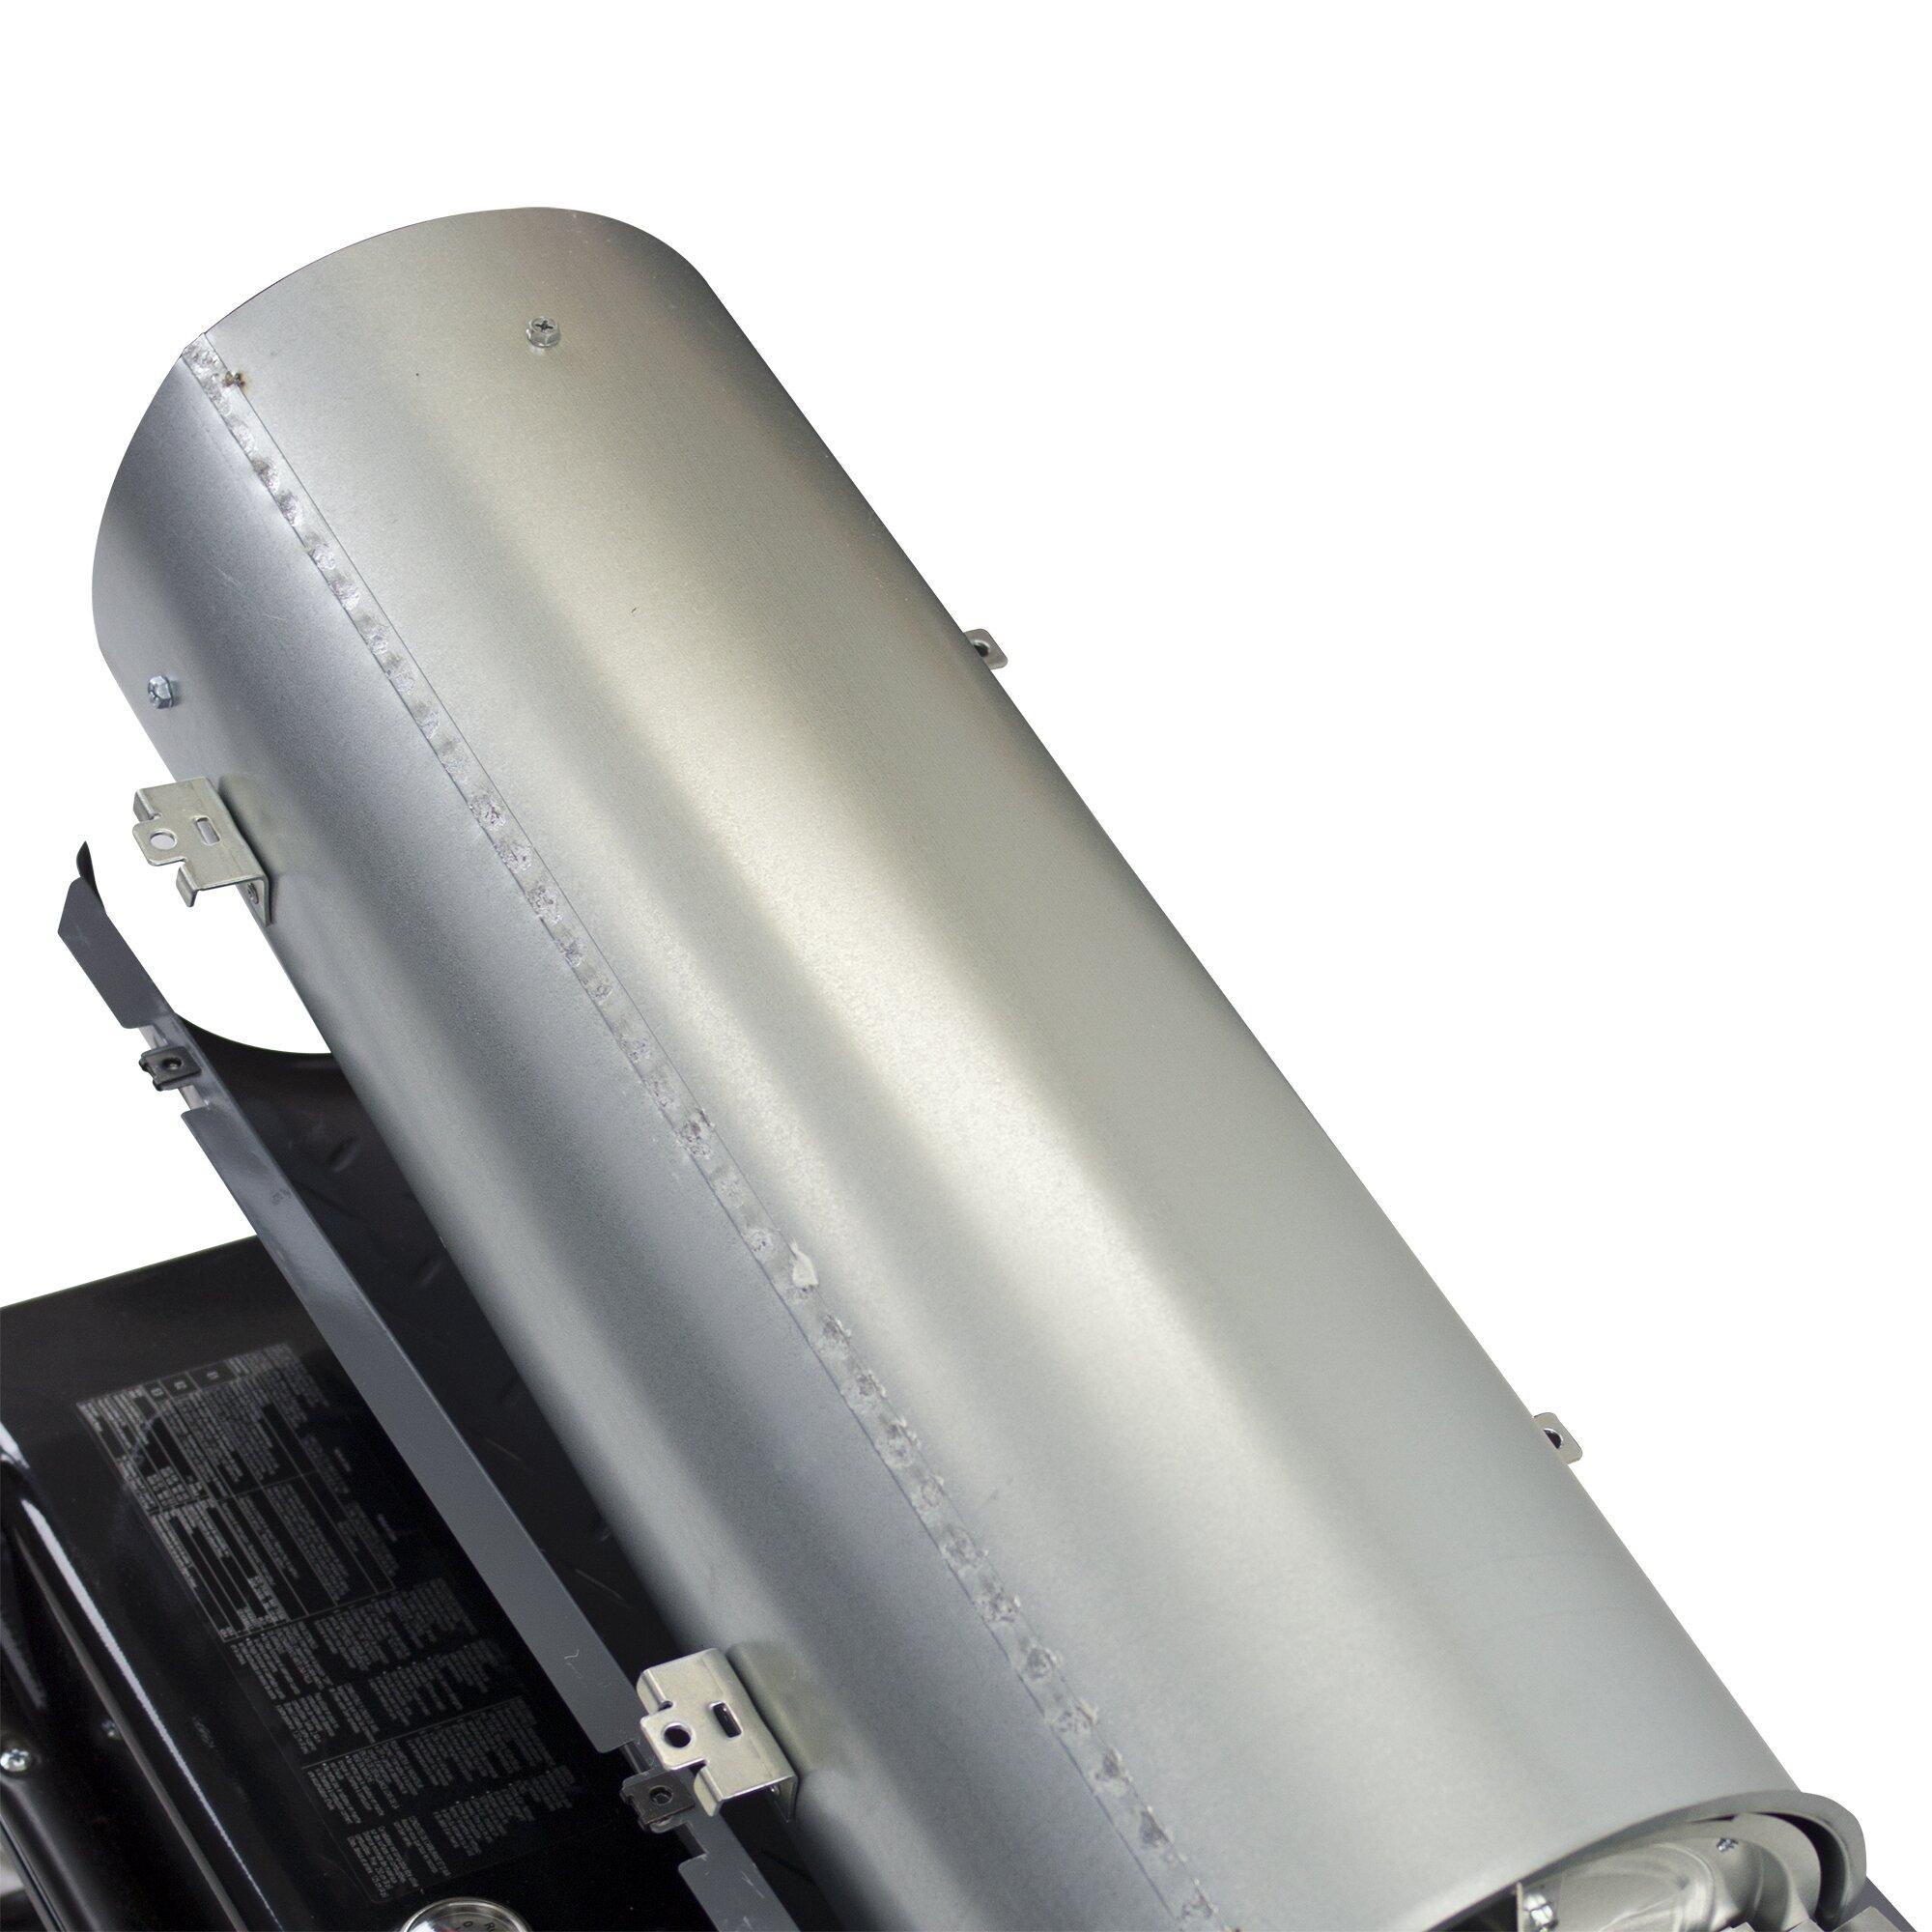 Dyna Glo Delux 135 000 Btu Kerosene Forced Air Heater With